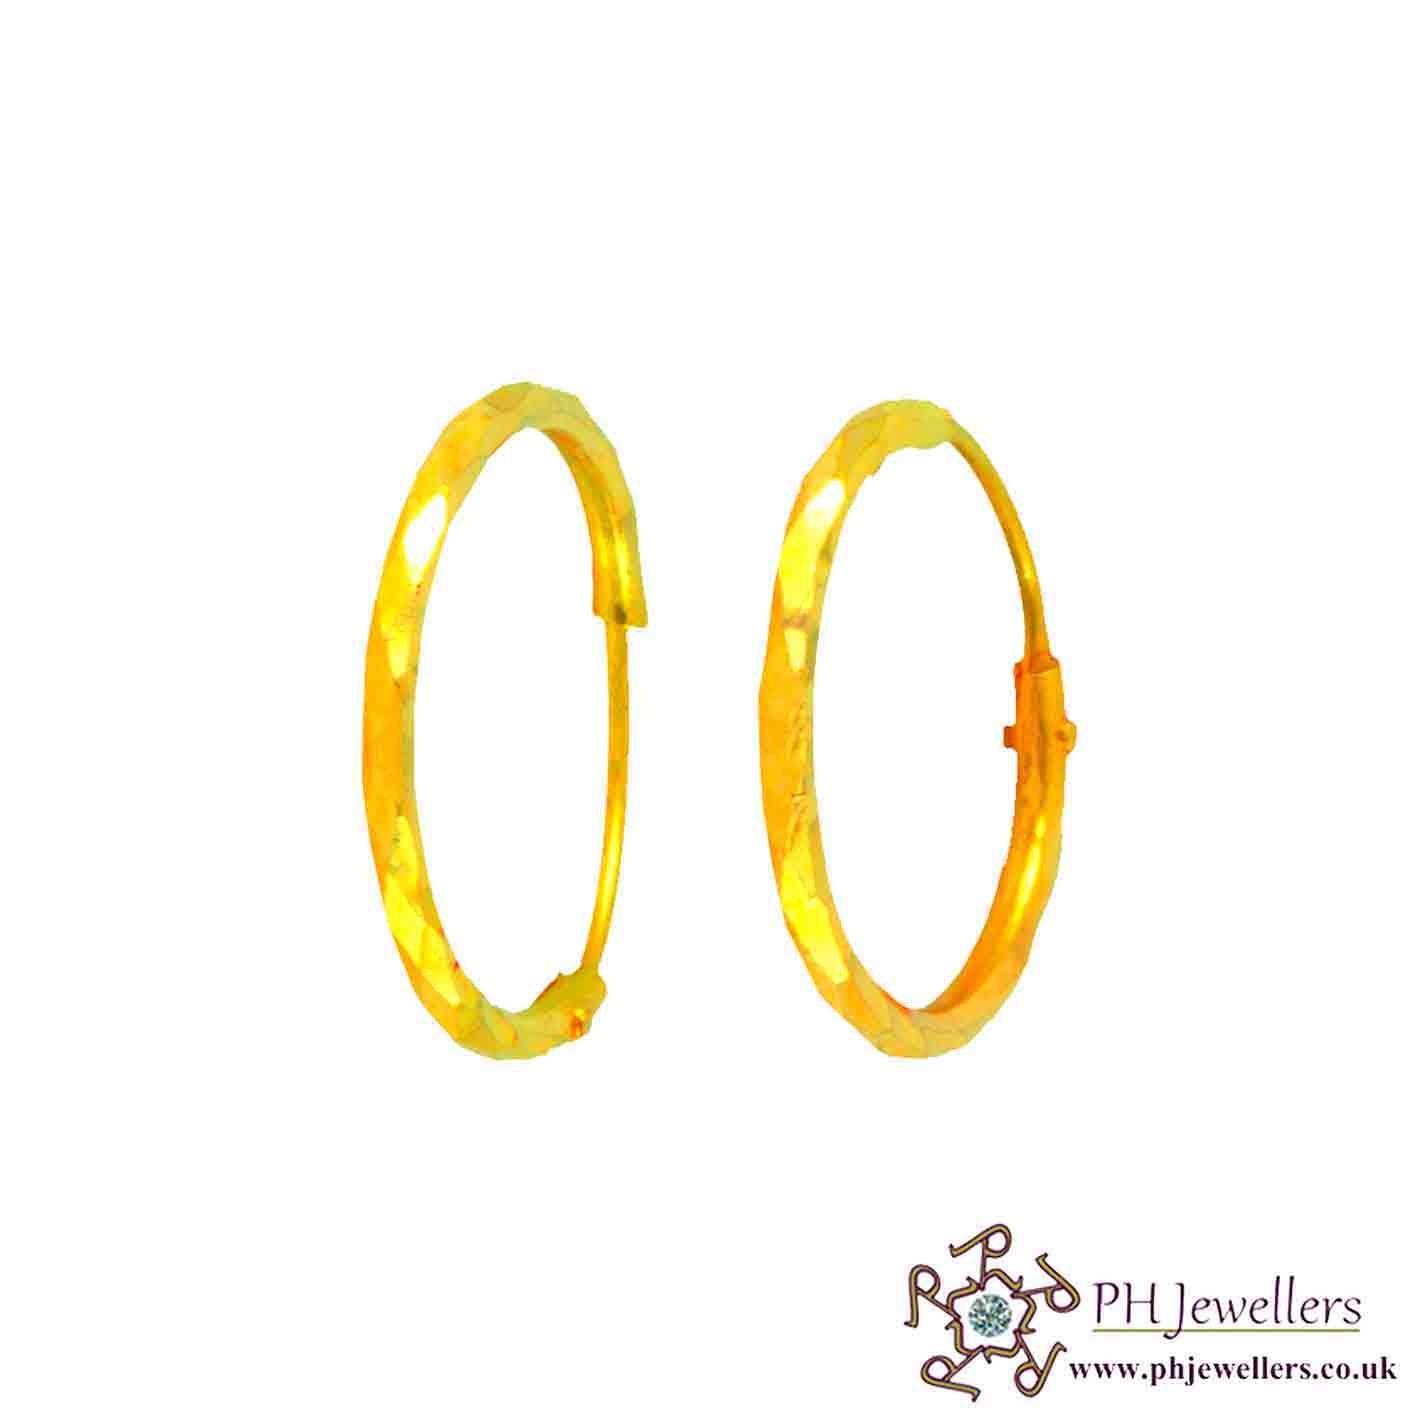 22 CT 916 Hallmark Yellow Gold Dangling Earrings CZ BE3